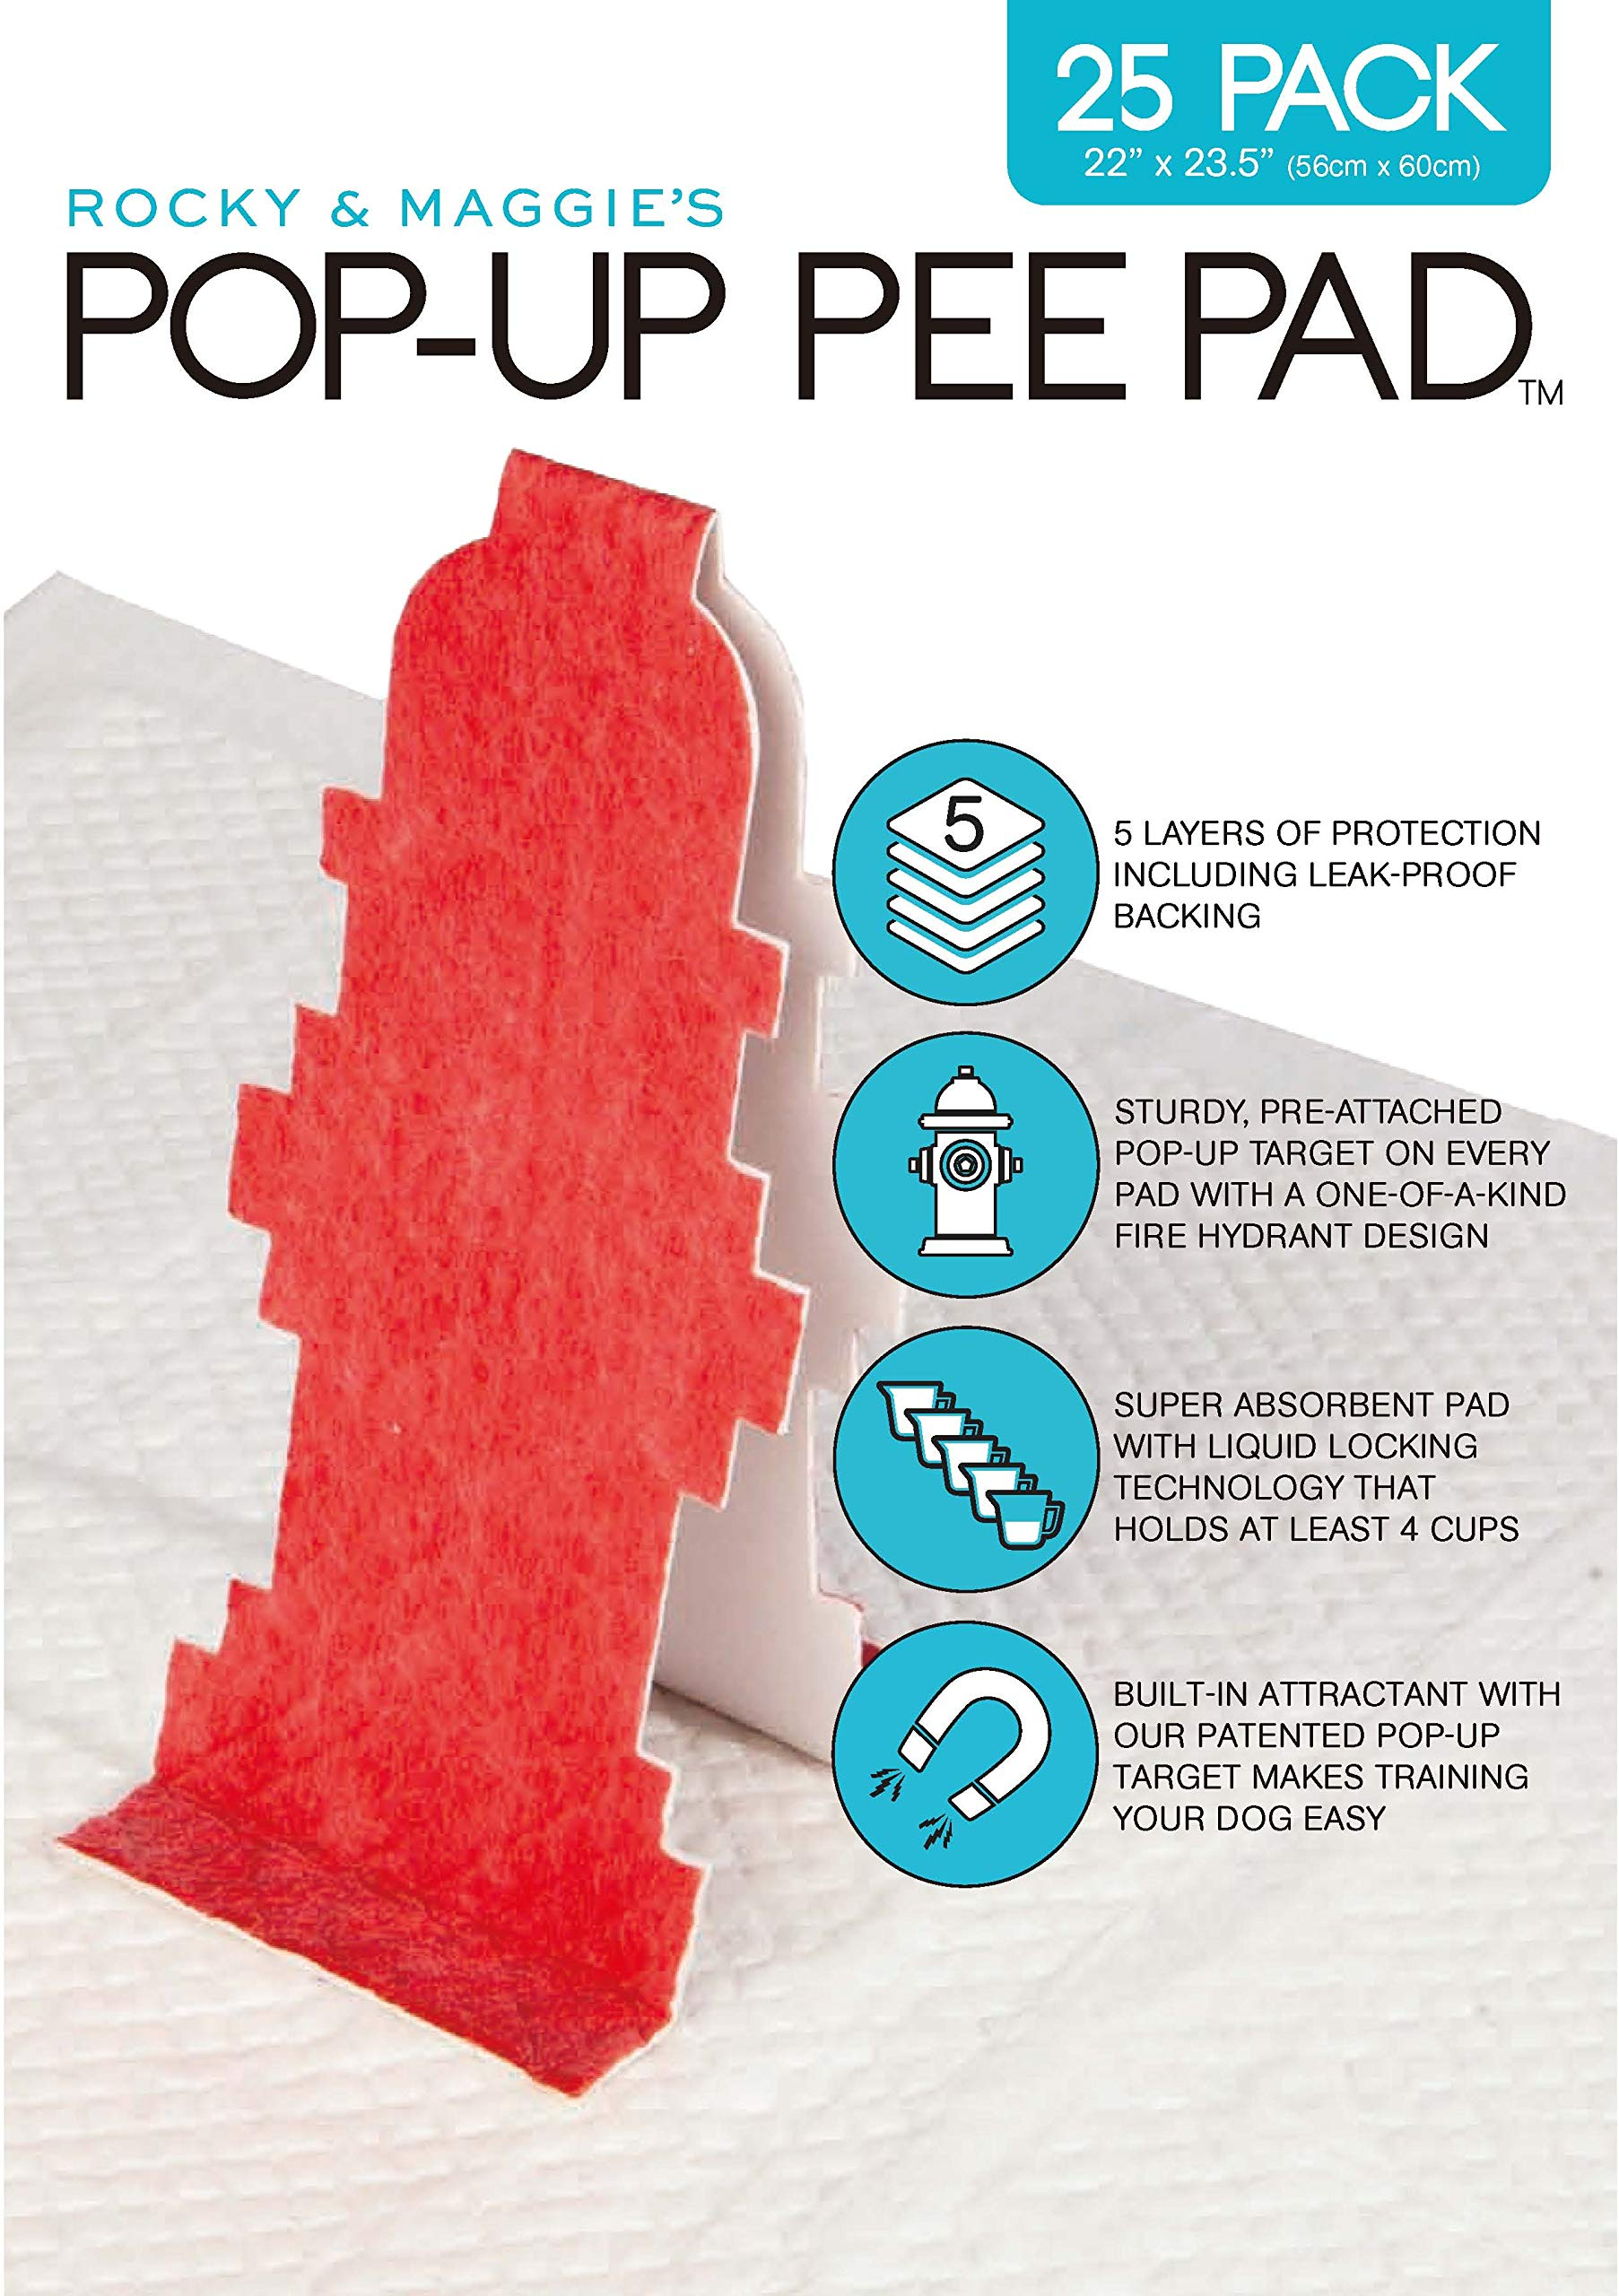 dog supplies online pop-up pee pad, 25 pads/box